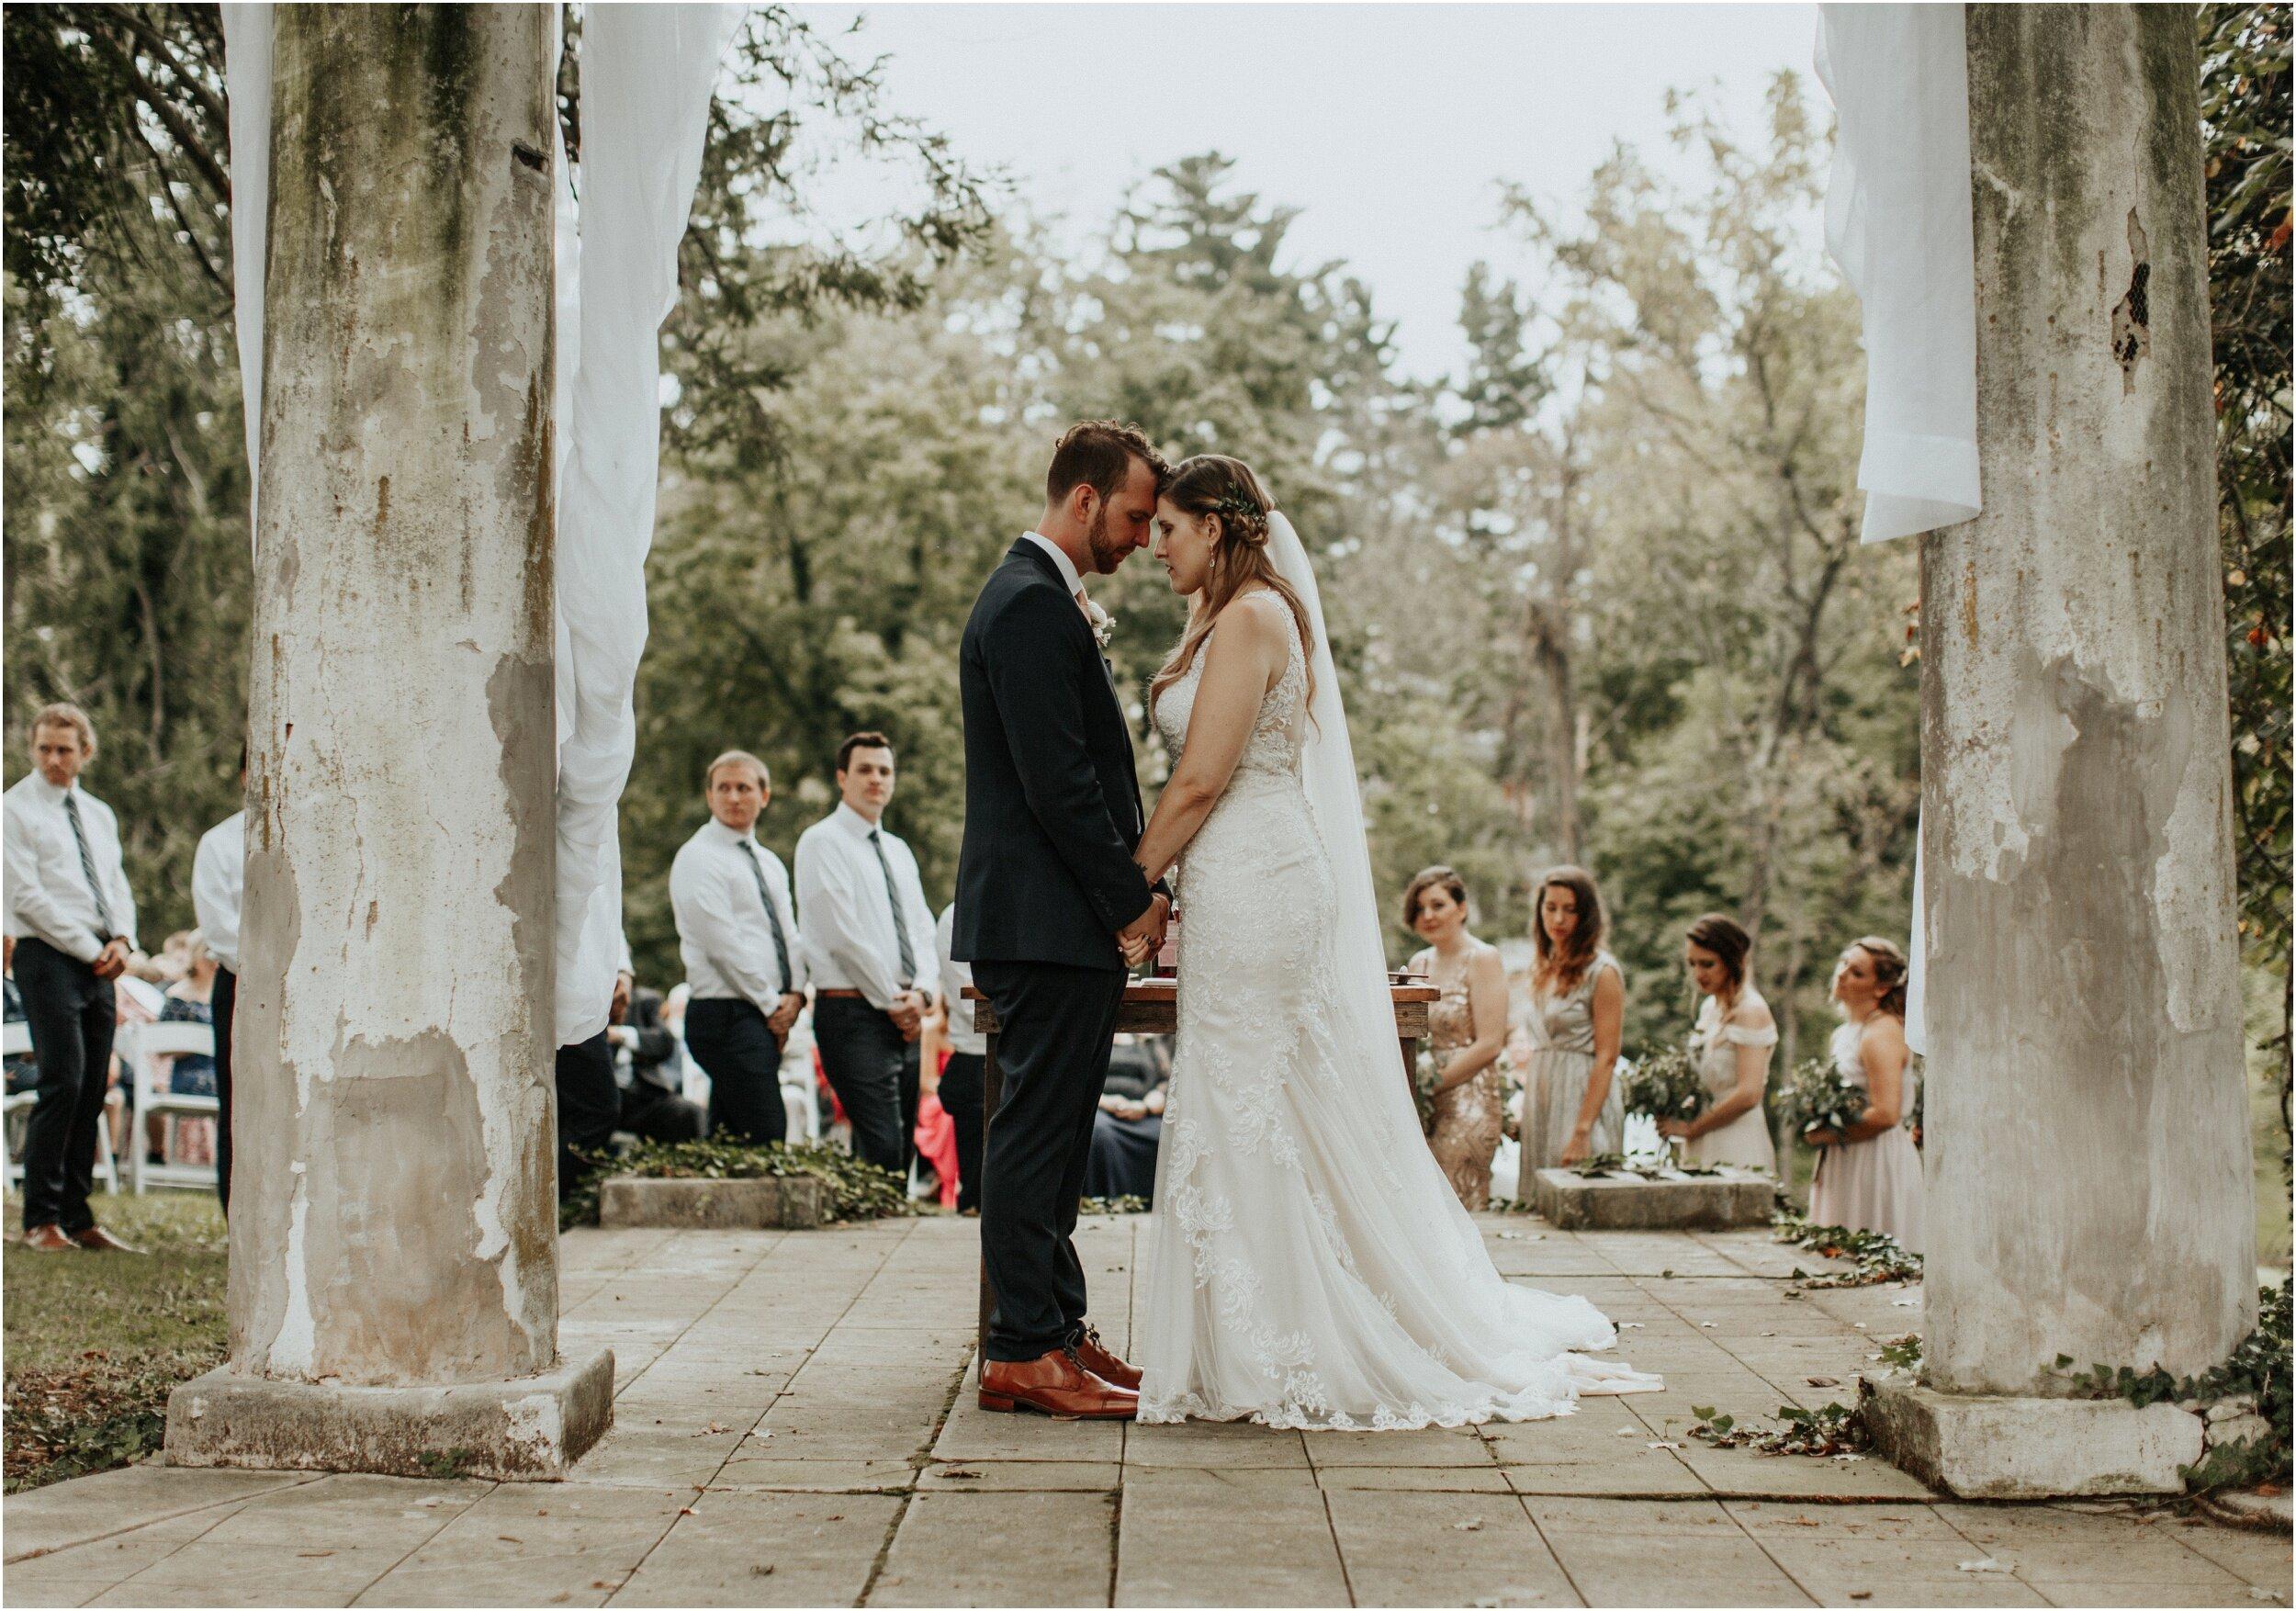 steph-and-jordan-cox-our-wedding-historic-shady-lane-compass-wedding-collective-hazel-lining-photography-destination-elopement-wedding-engagement-photography_0062.jpg